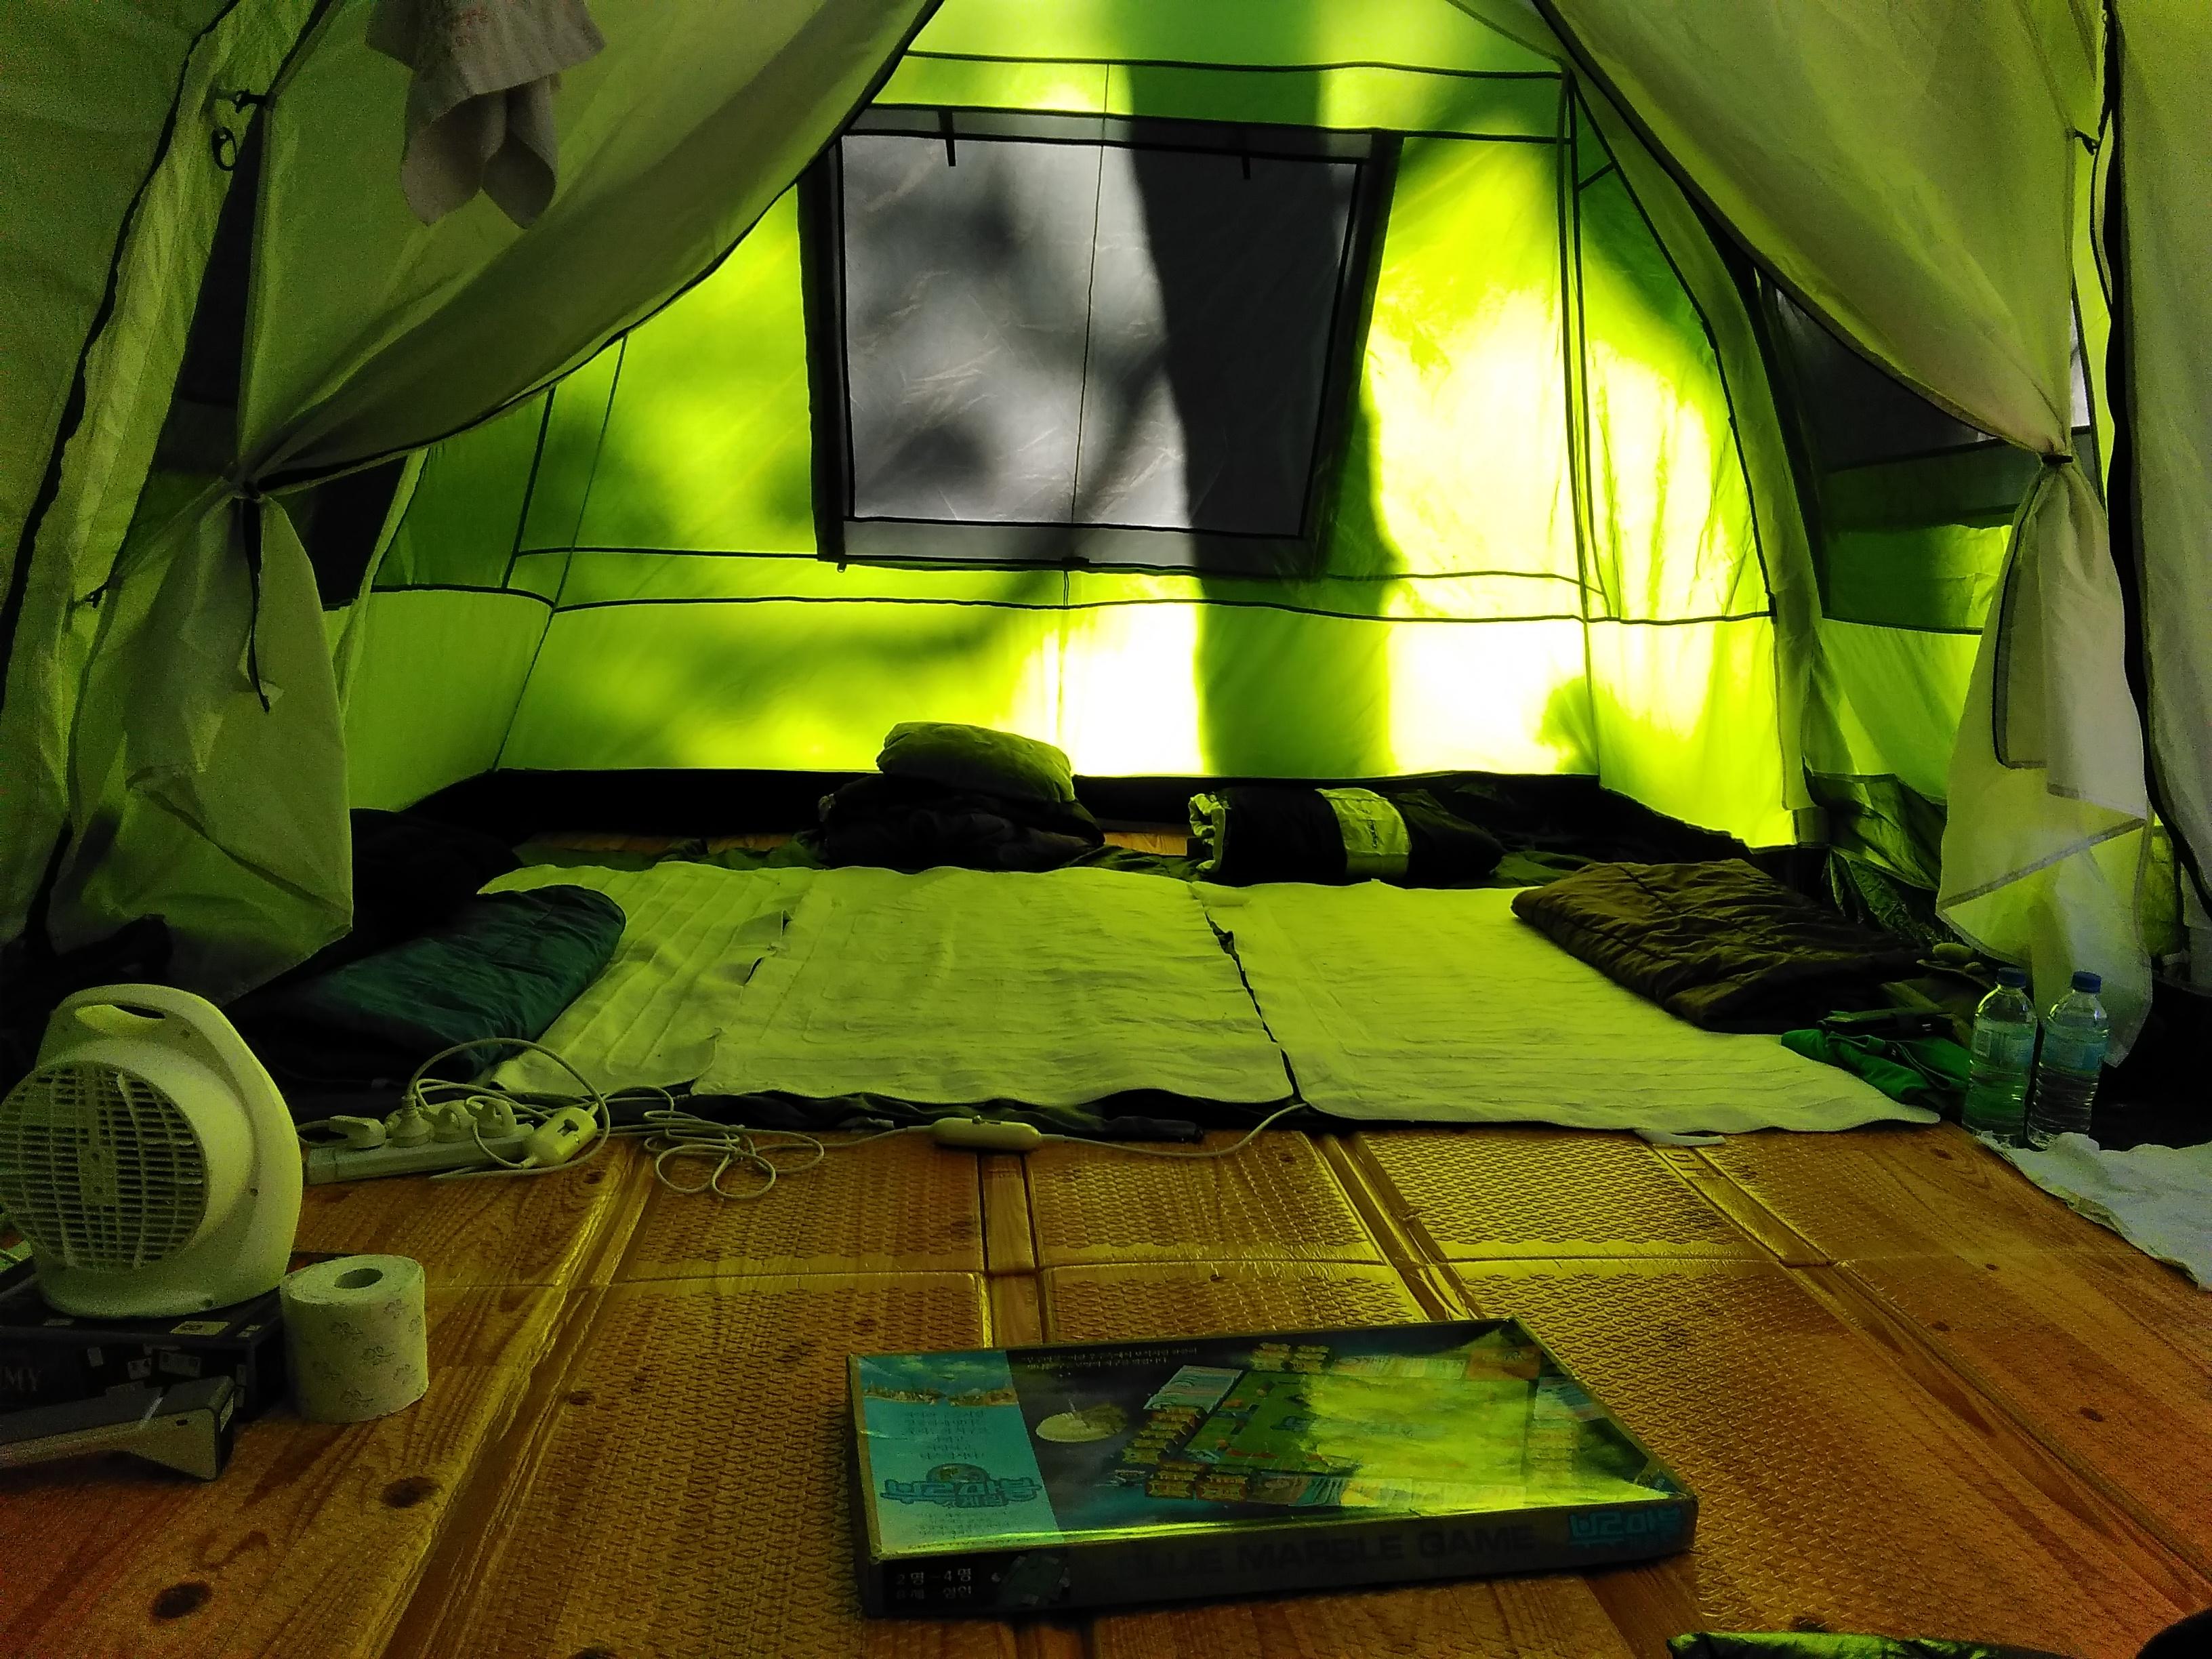 Lake leschenaultia camping 둘째날